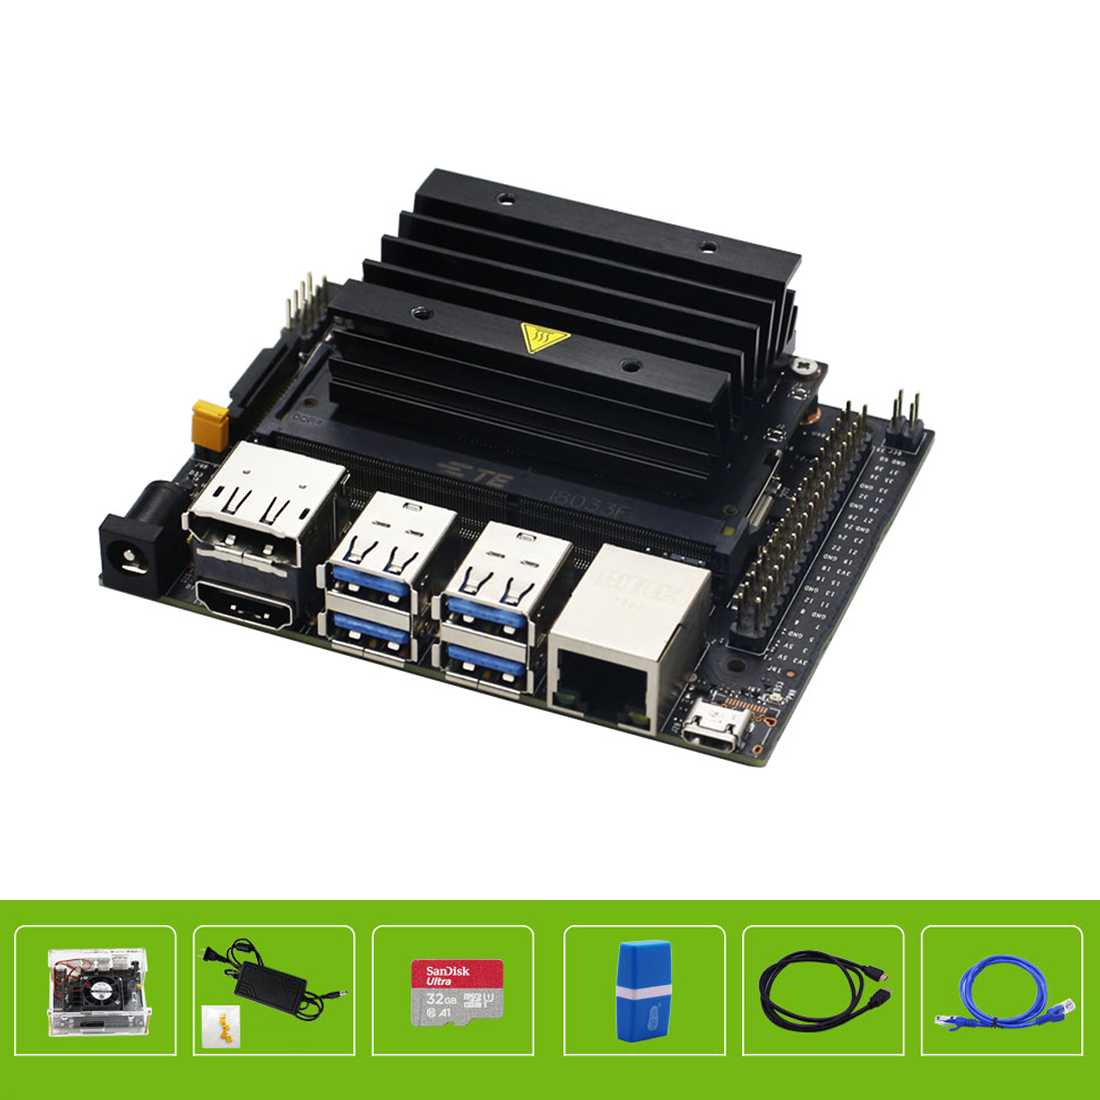 32GB SD Card FOR Jetson NANO Programmable Robot Set Development Board Kit